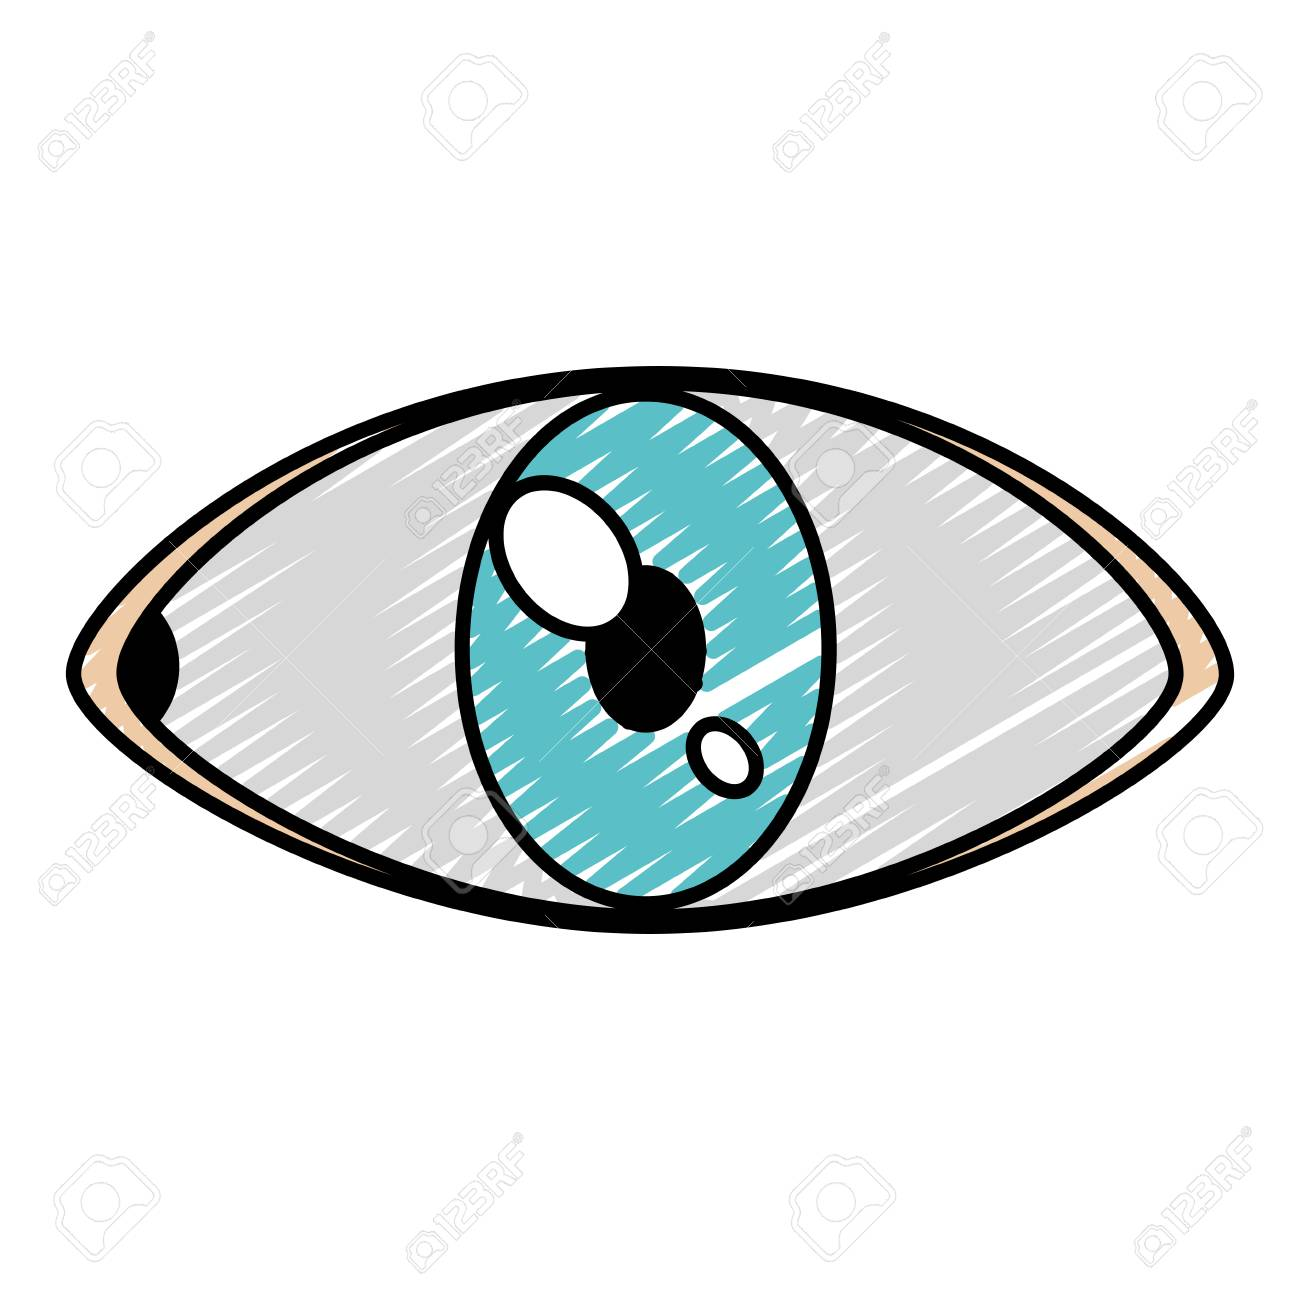 Doodle Eye Human Anatomy Vision Design Vector Illustration Royalty